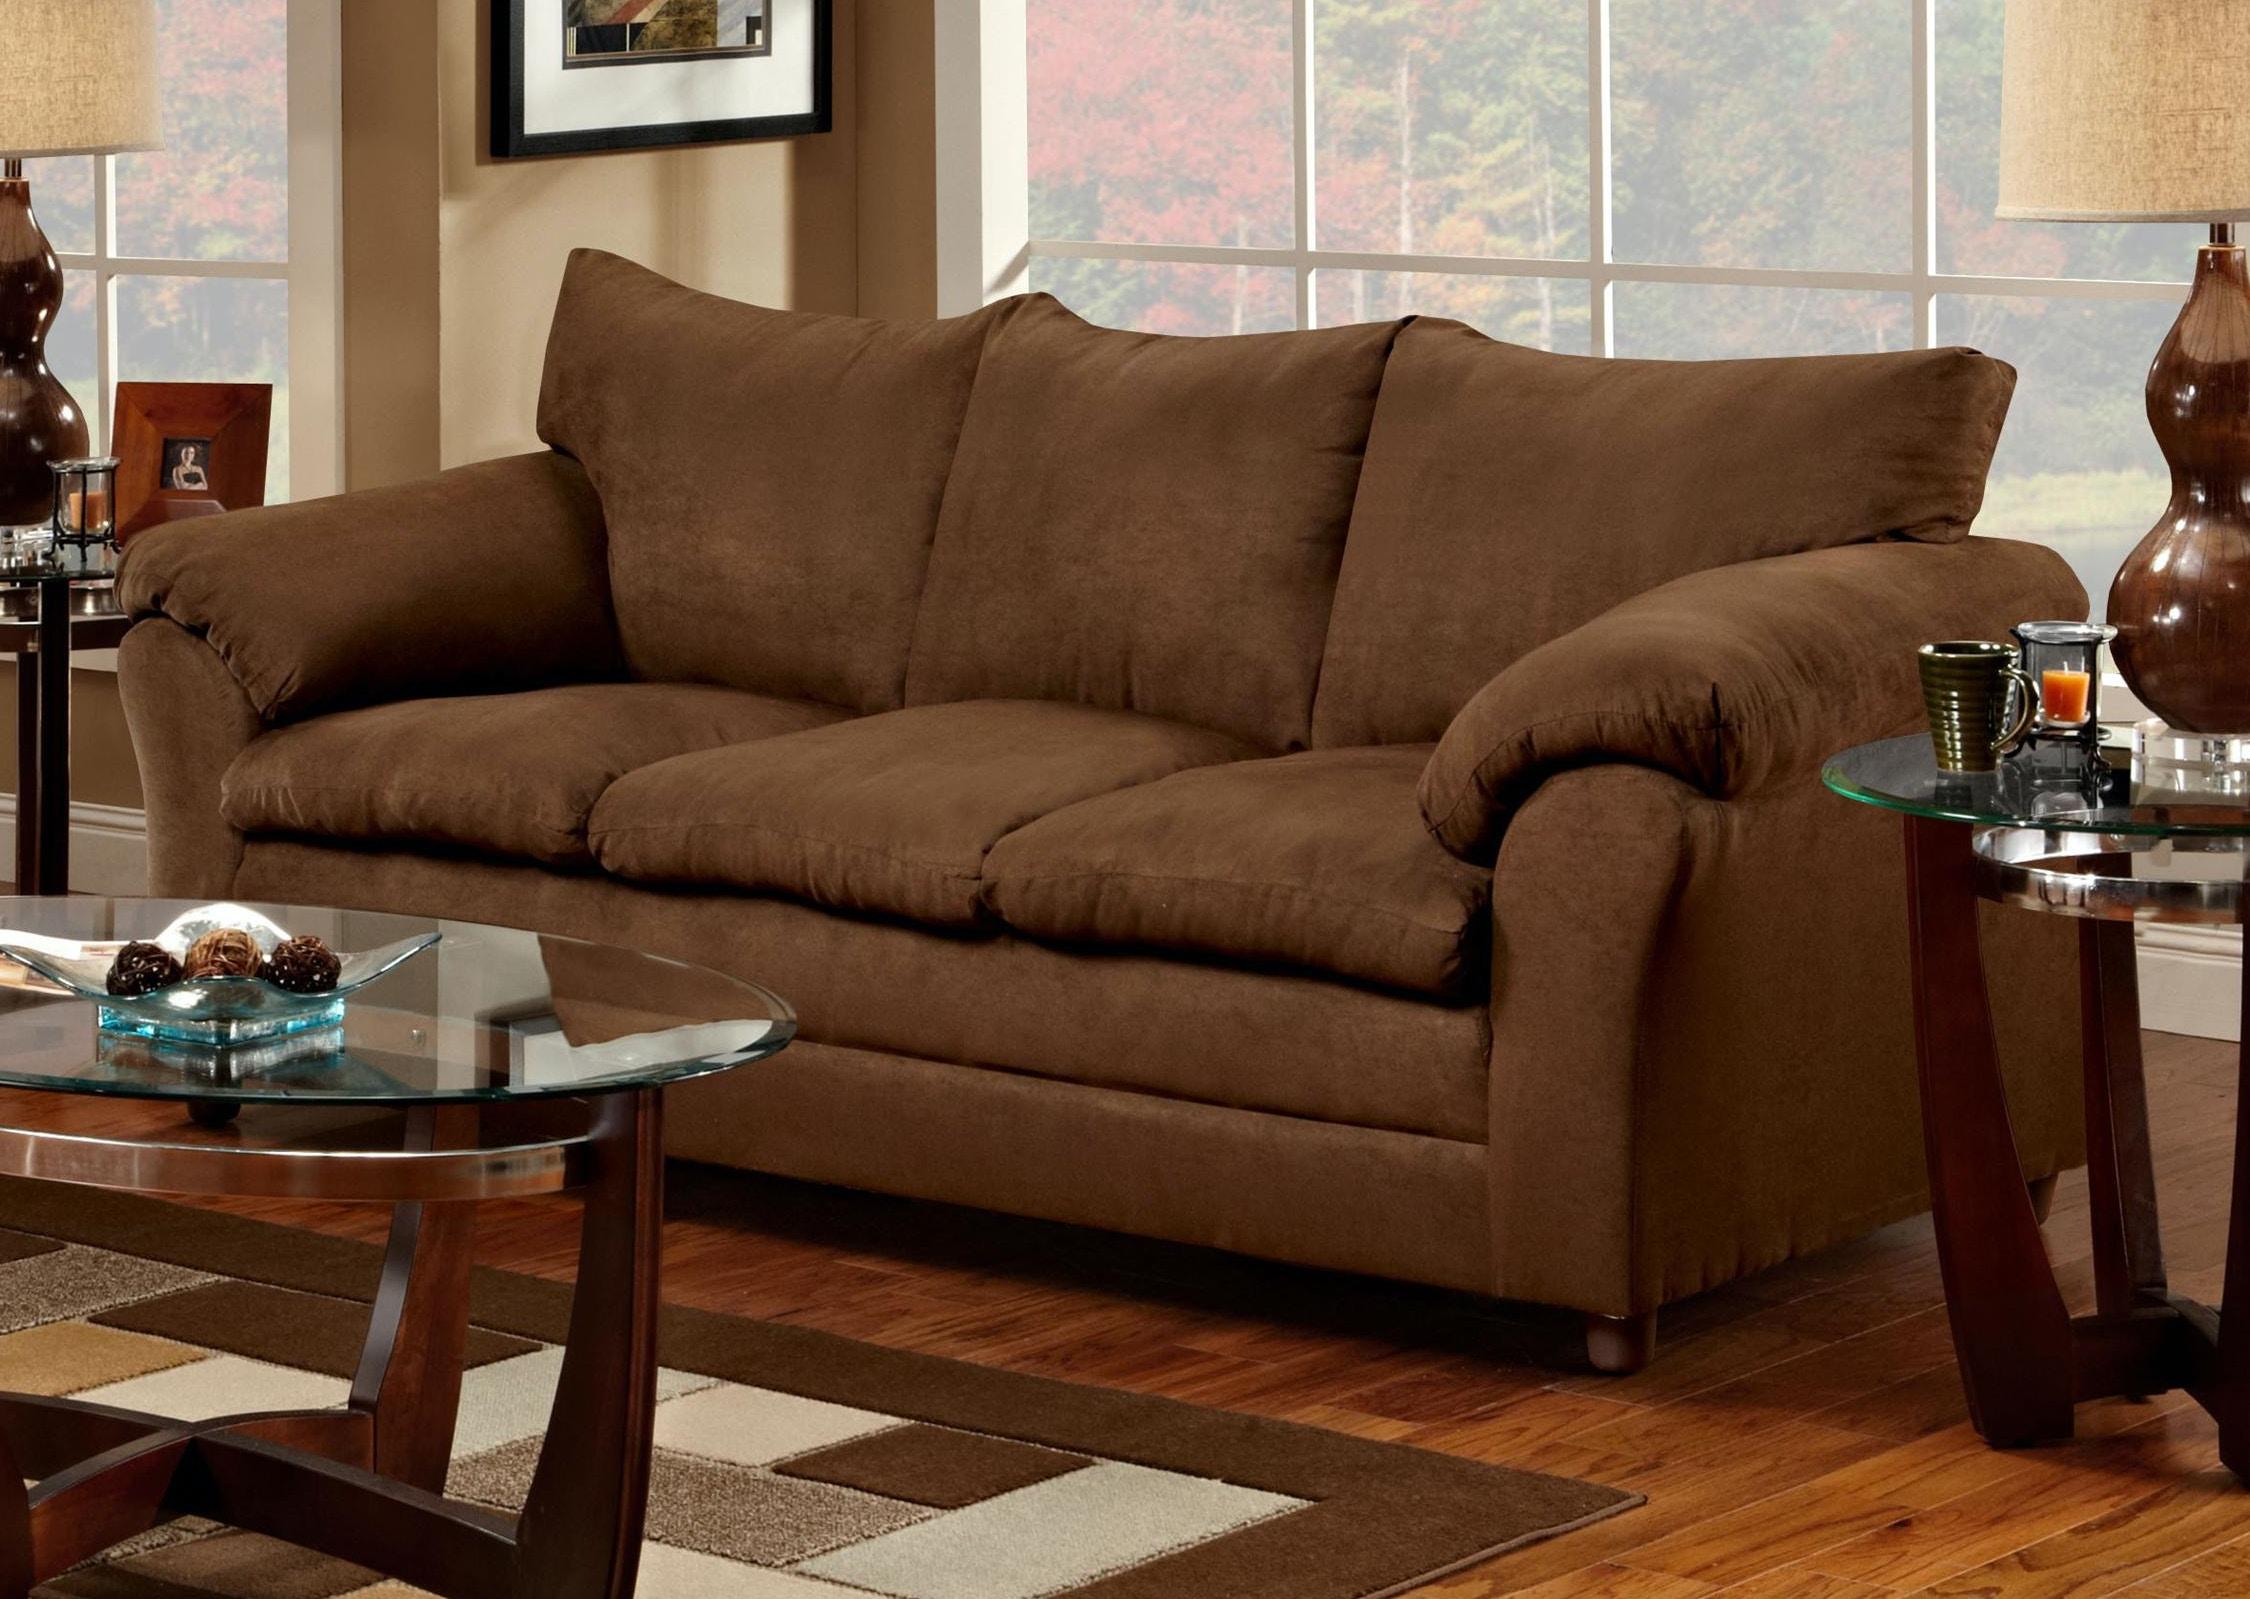 Washington Living Room Chocolate Sofa Furniture